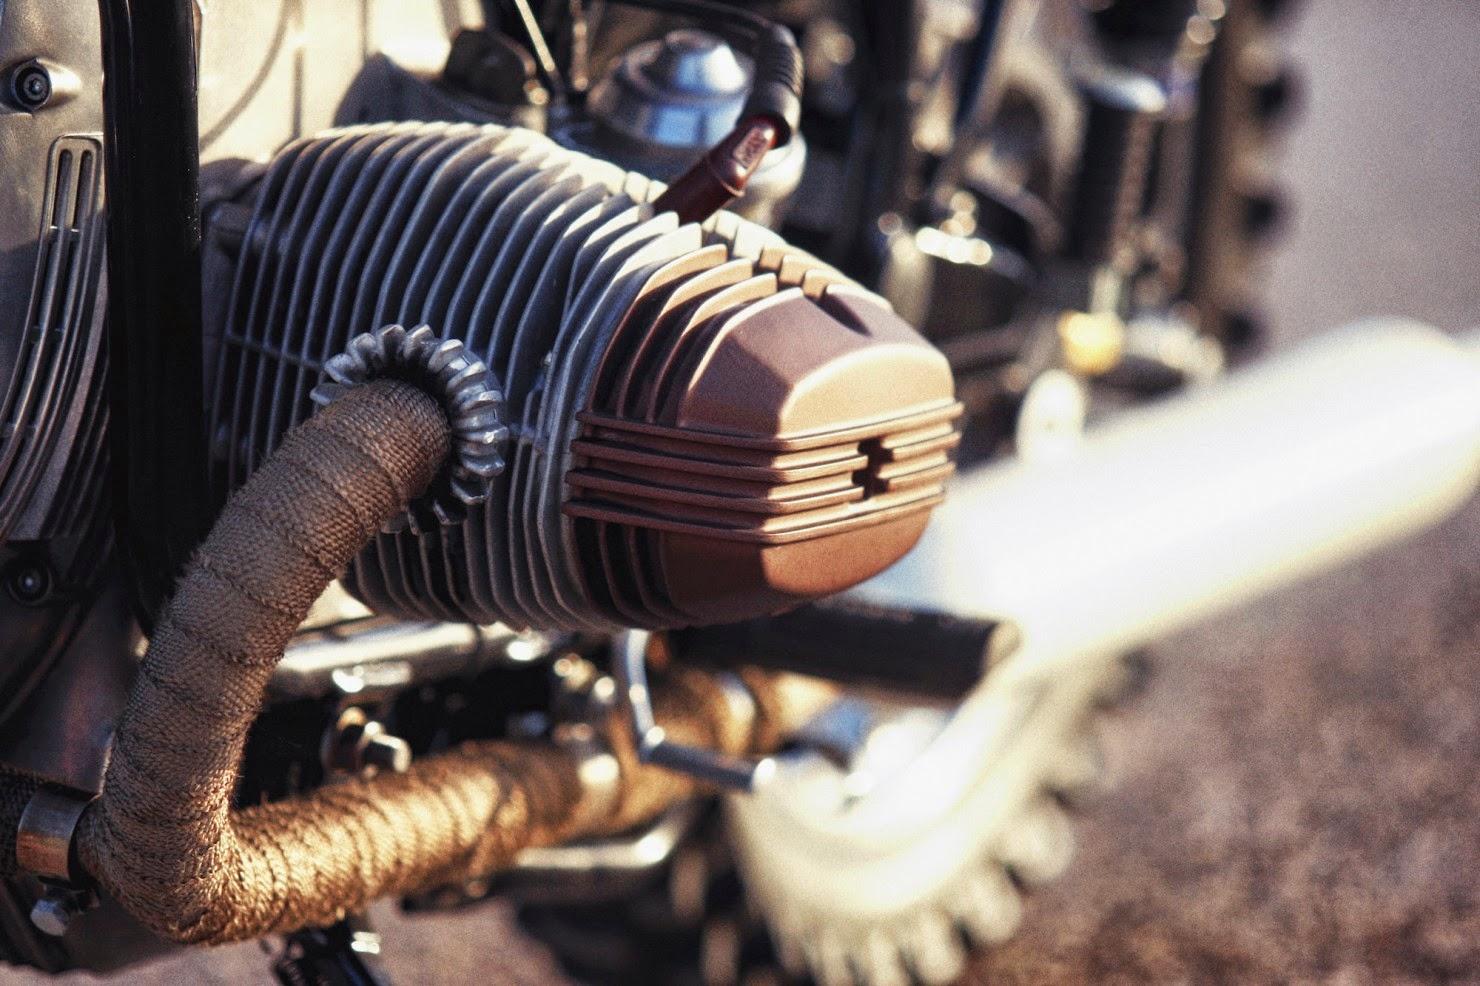 BMW-R45-Custom-Motorcycle-17-1480x986